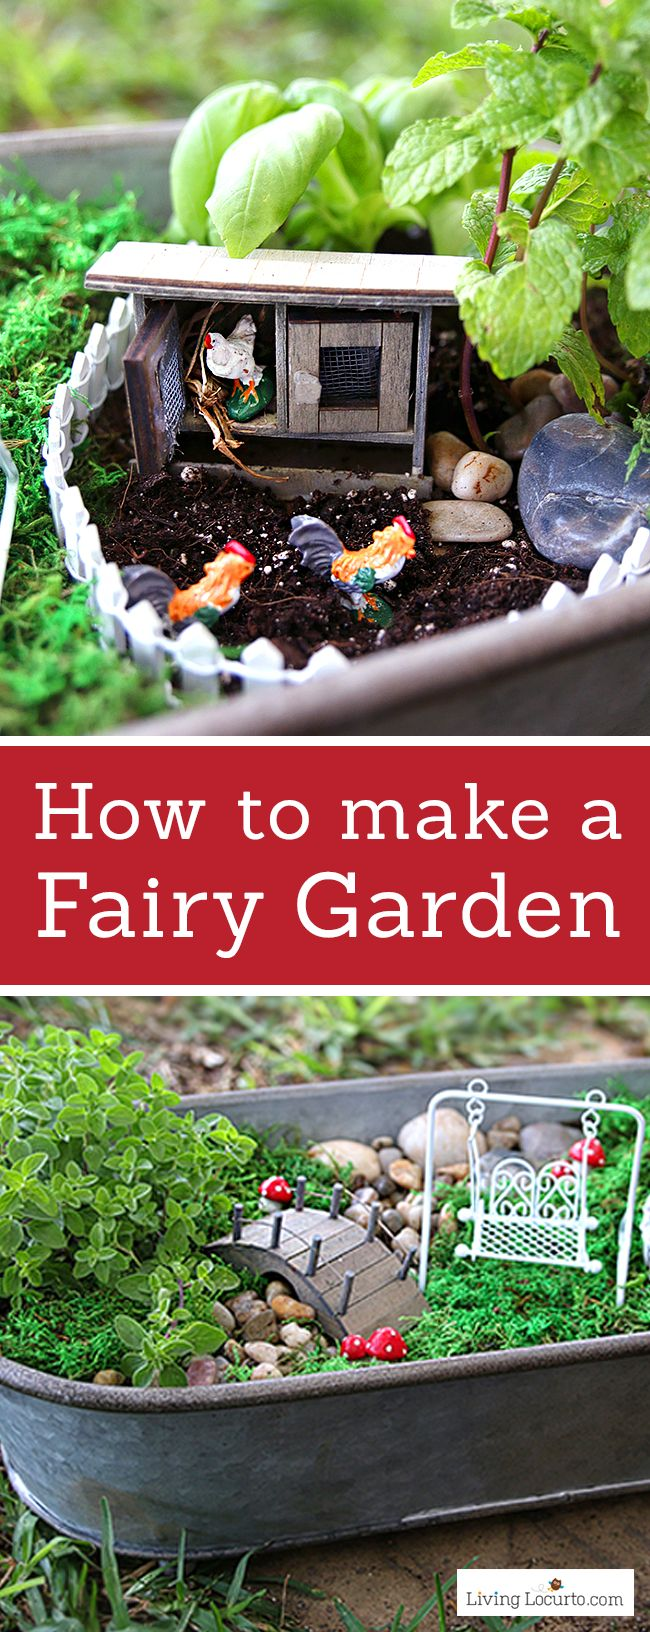 25 unique indoor fairy gardens ideas on pinterest diy fairy garden miniature gardens and - How to make a fairy garden container ...